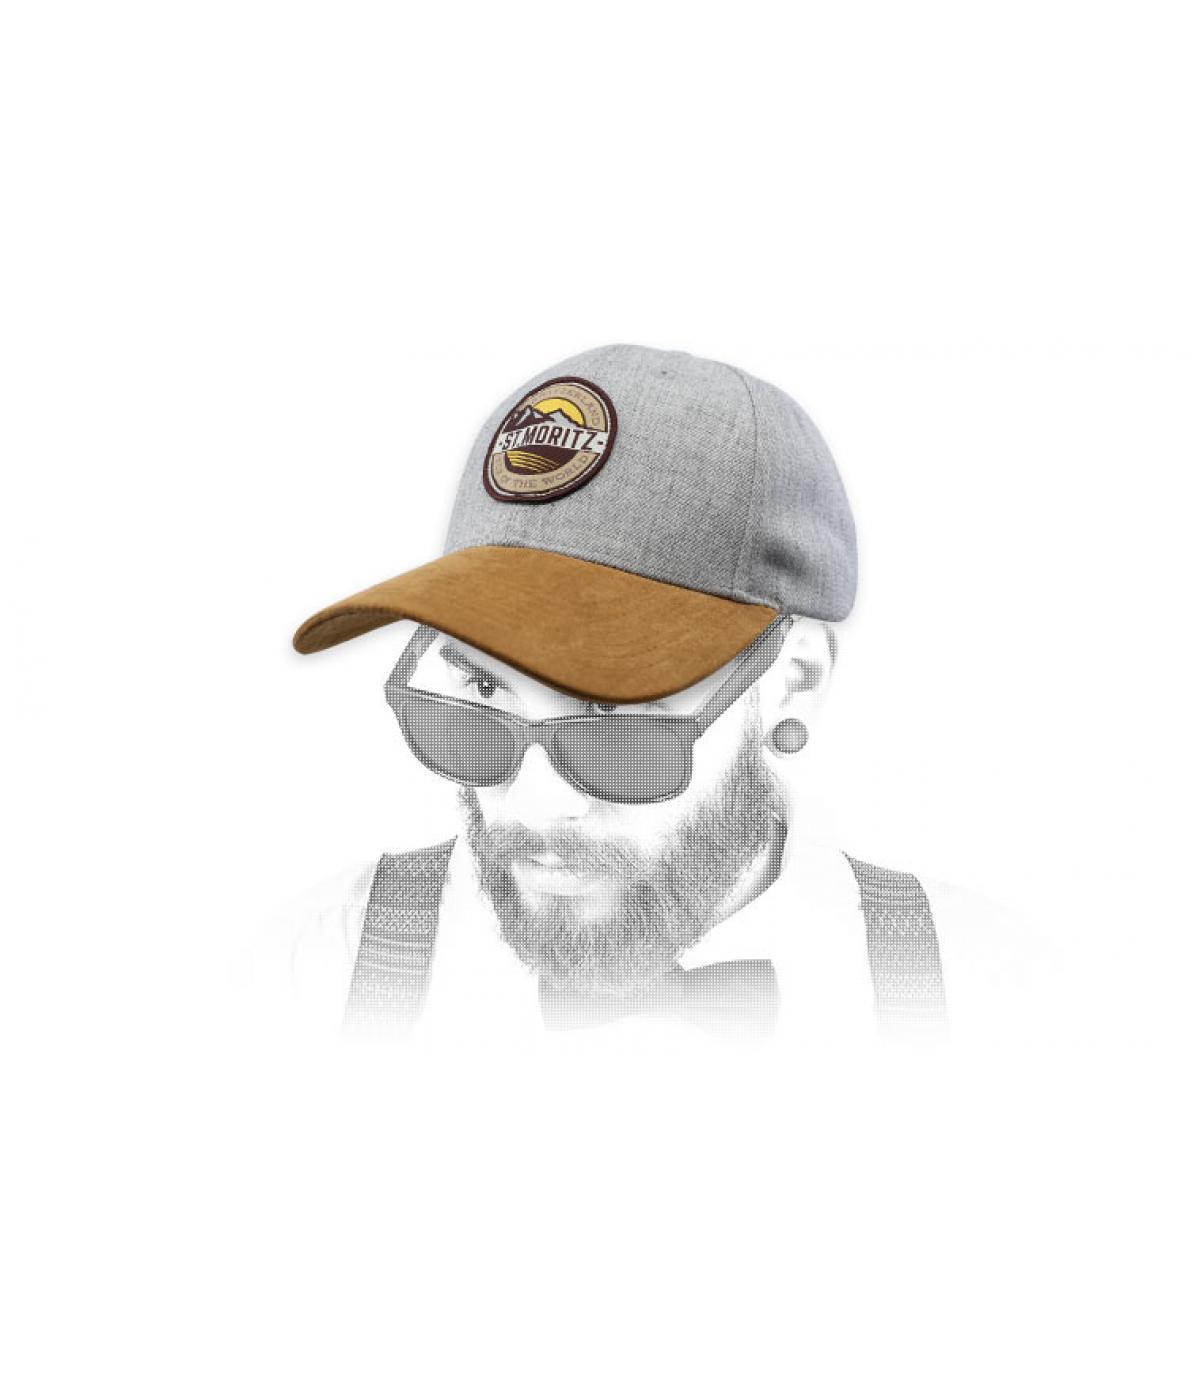 grey st moritz cap